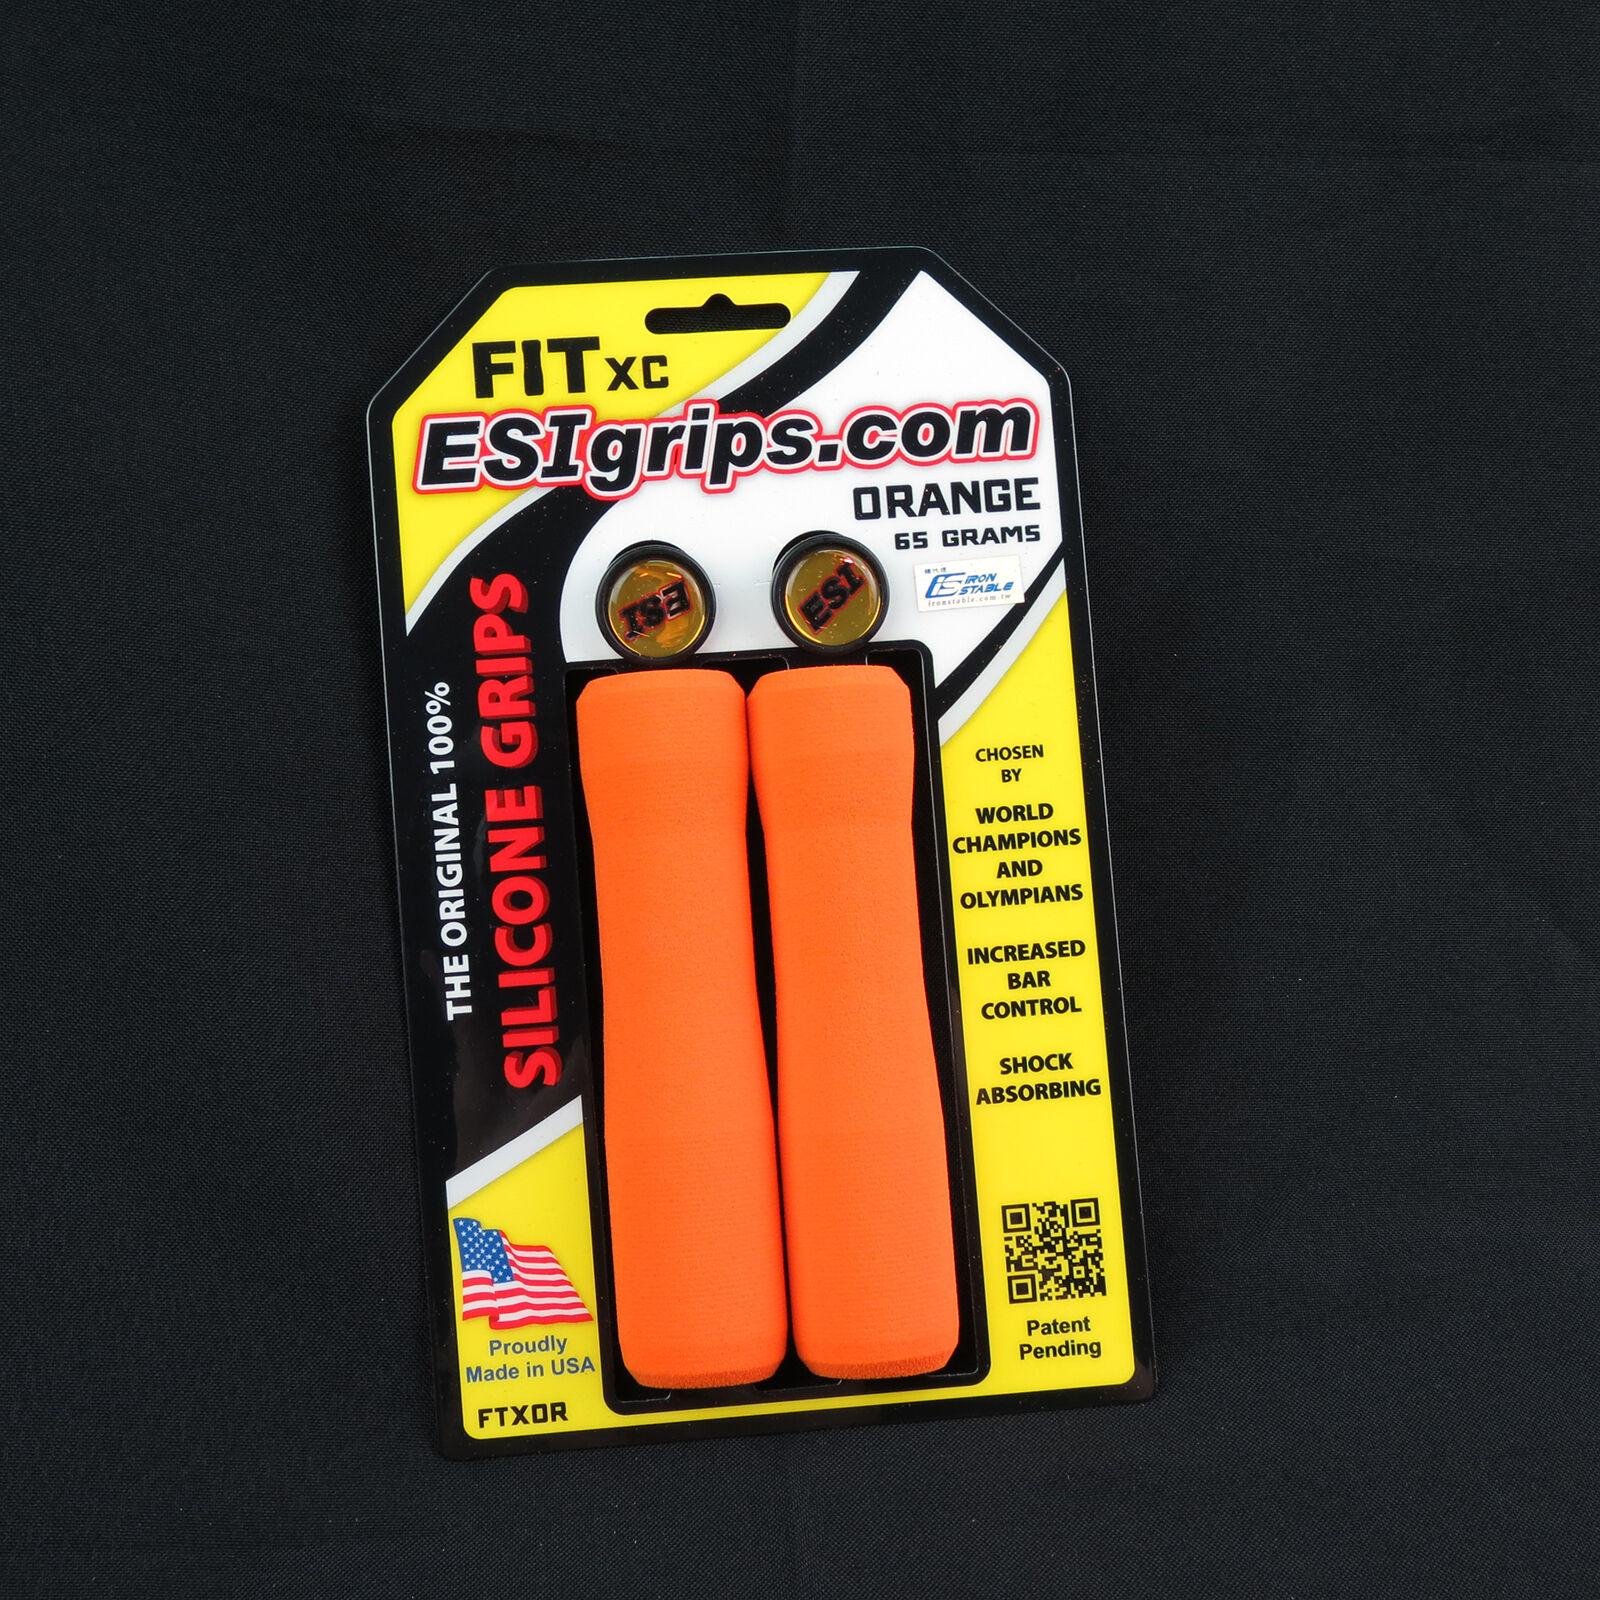 ESI FIT XC Silicone MTB Mountain Bike Bicycle Handlebar Bar Grips   65g - orange